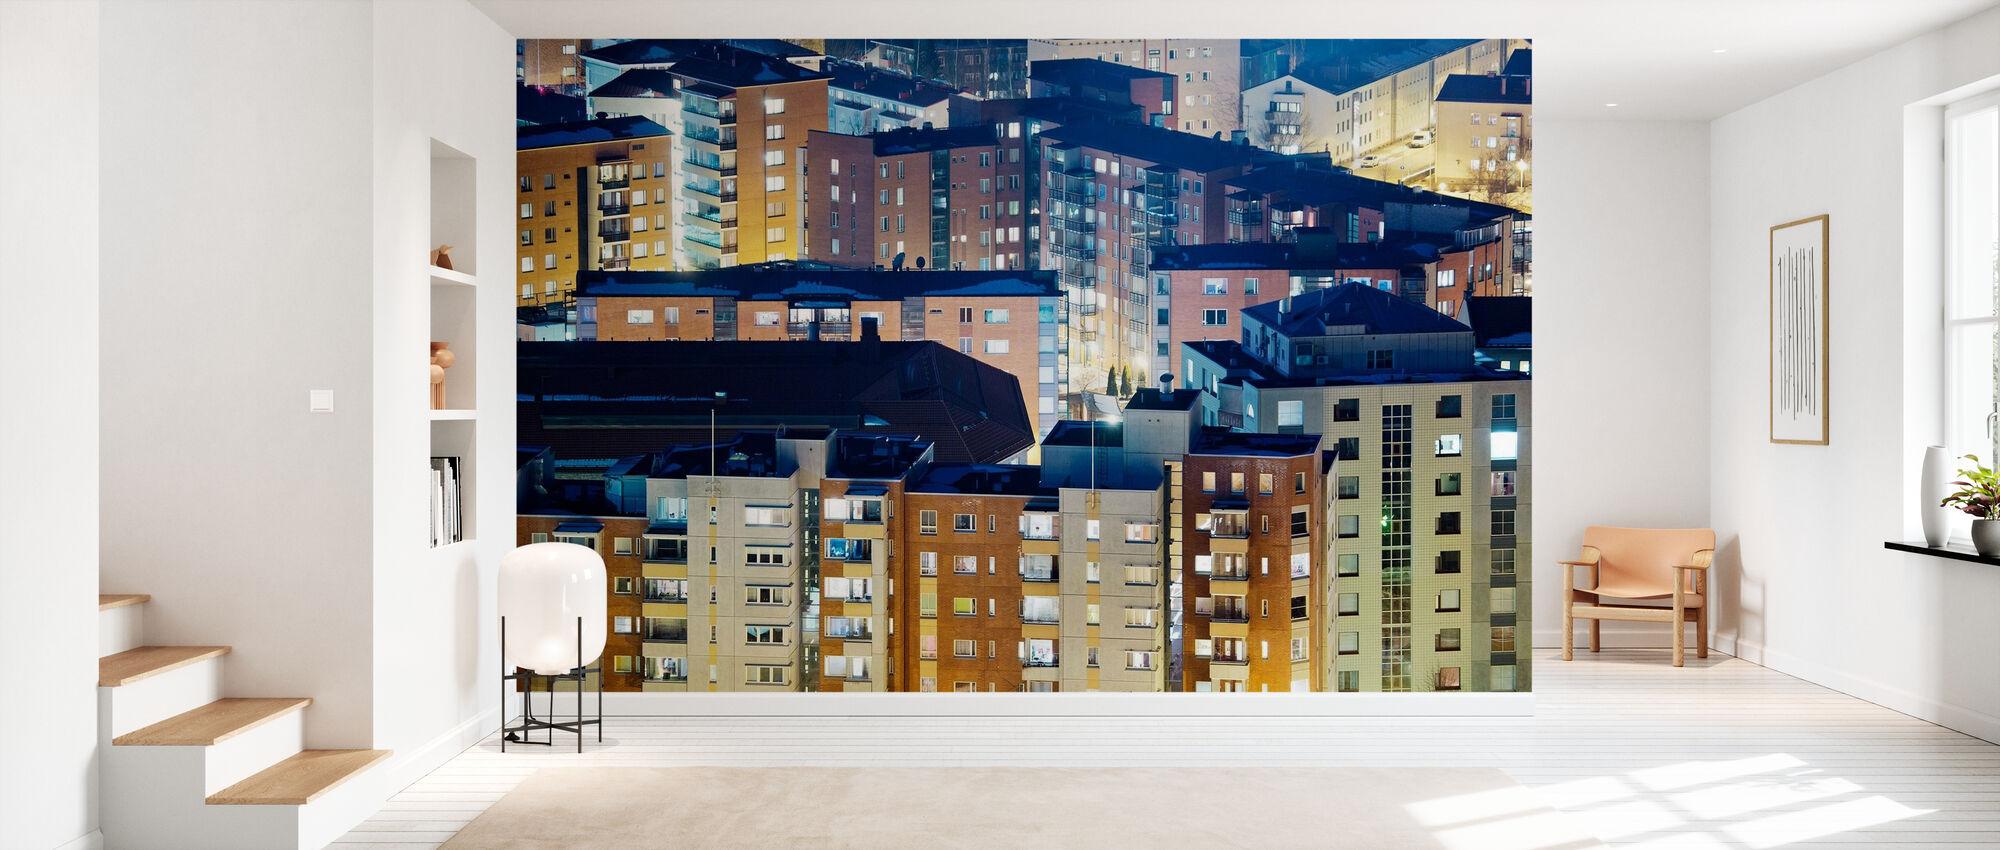 Roofs of Finland - Wallpaper - Hallway